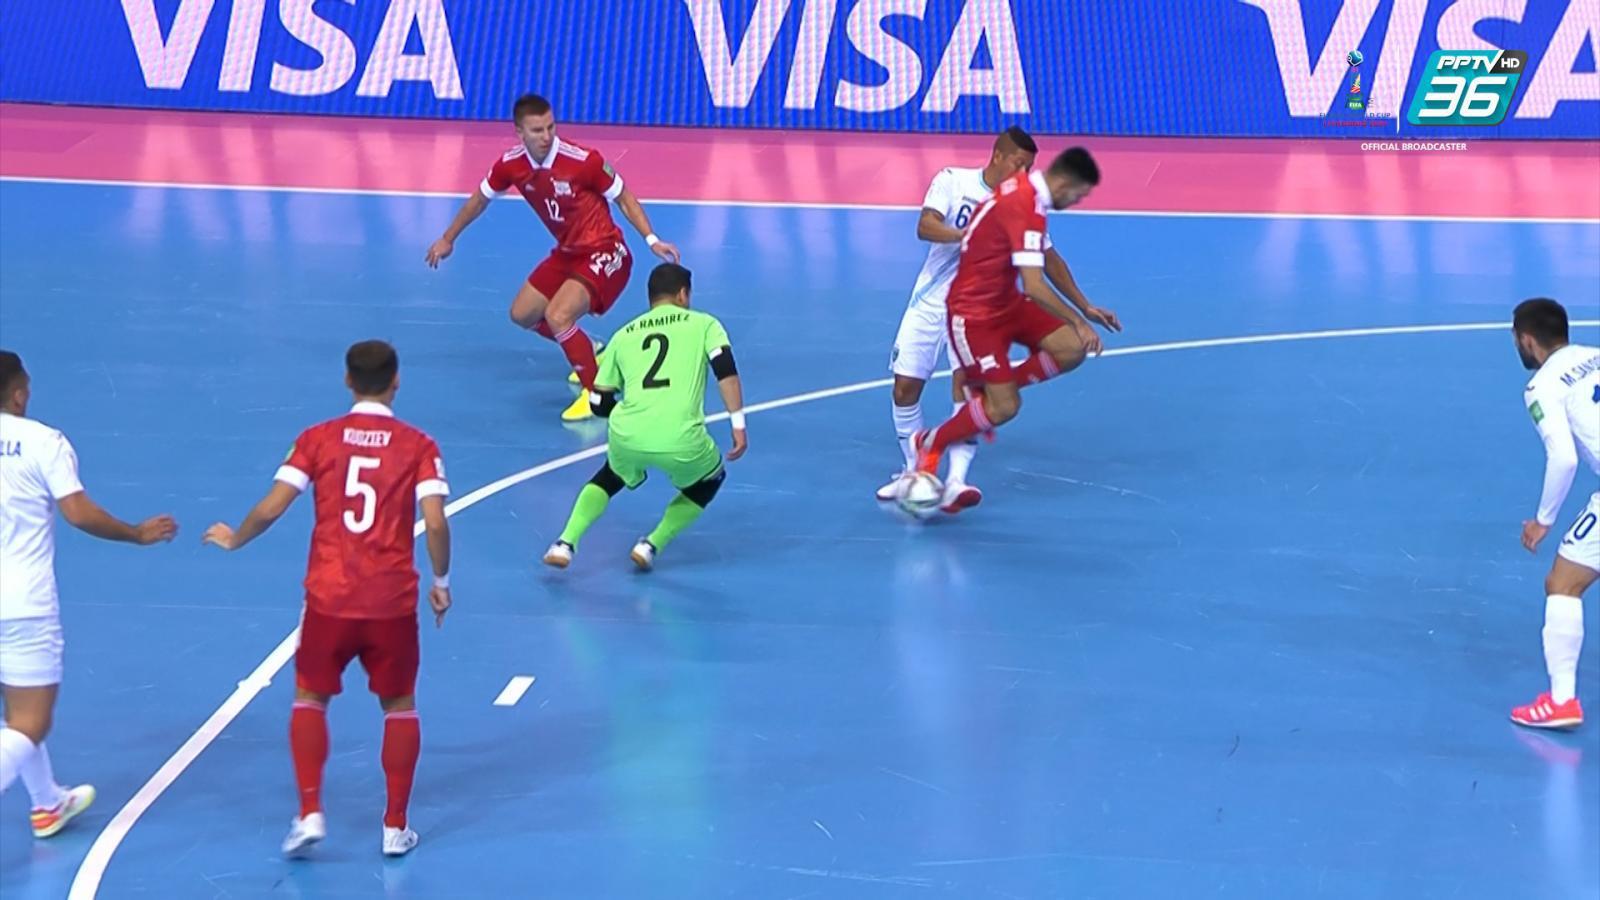 Full Match | ฟีฟ่า ฟุตซอล เวิลด์ คัพ 2021 | กัวเตมาลา พบ รัสเซีย | 18 ก.ย. 64